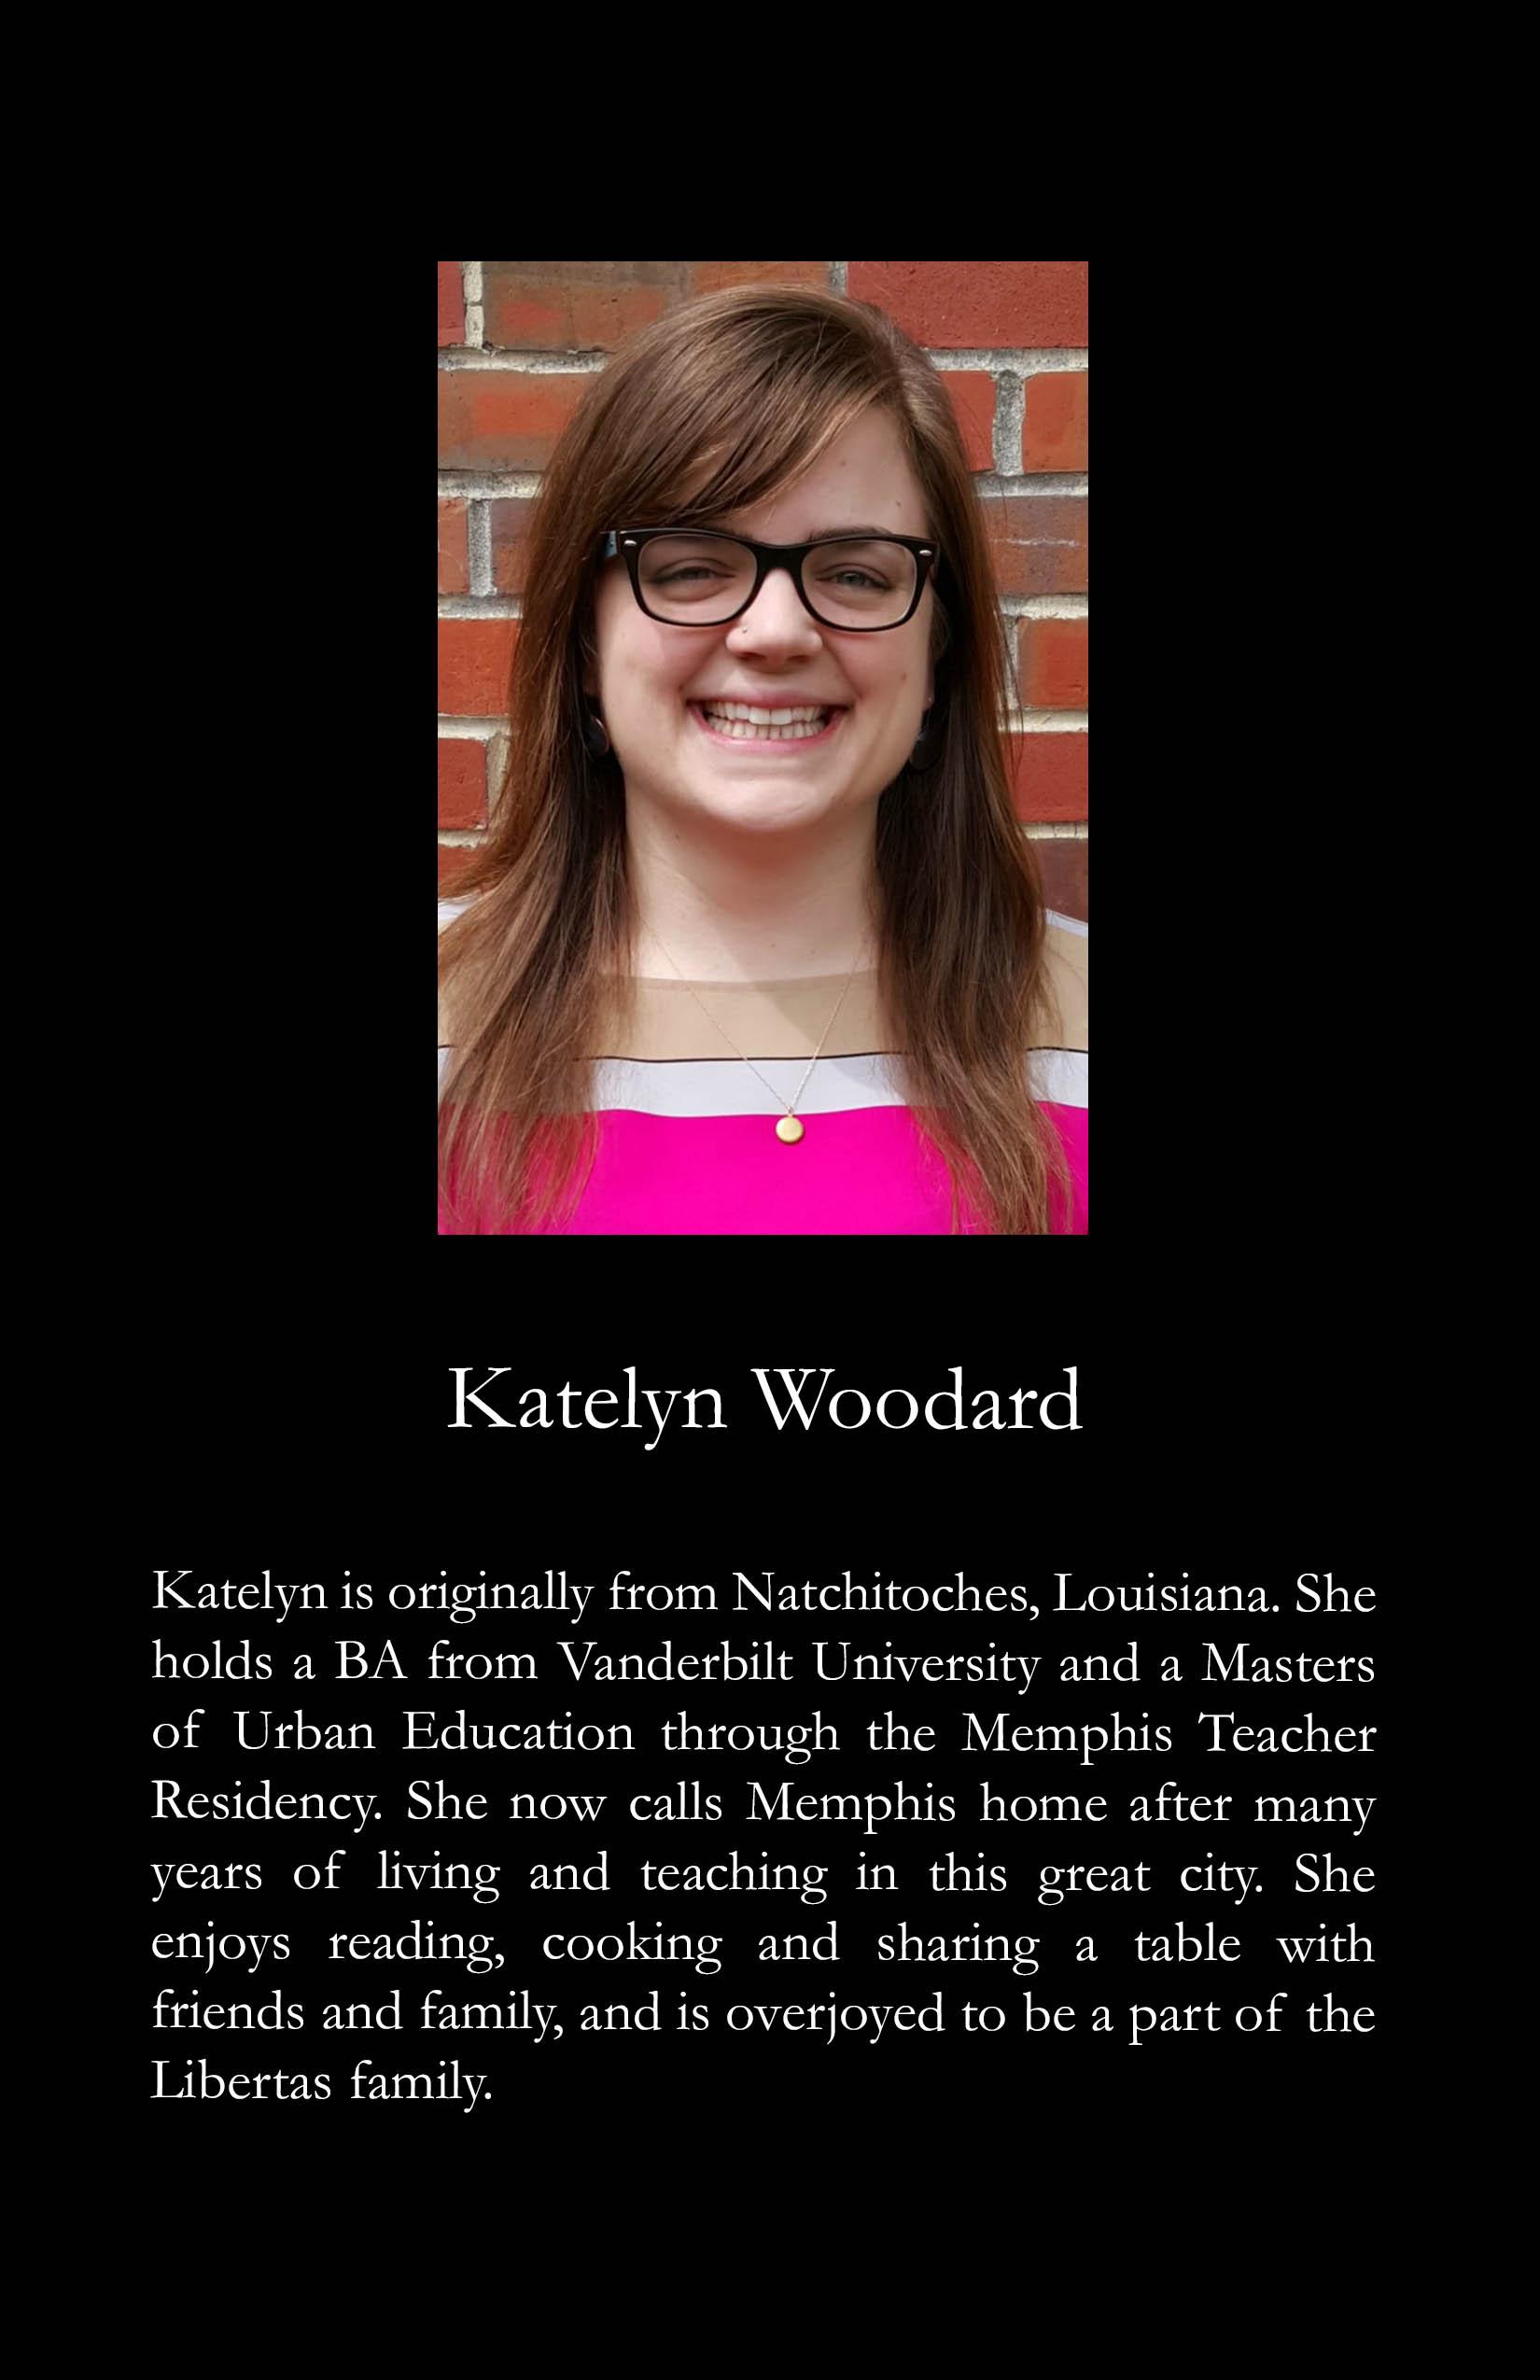 Katelyn Woodard.jpg